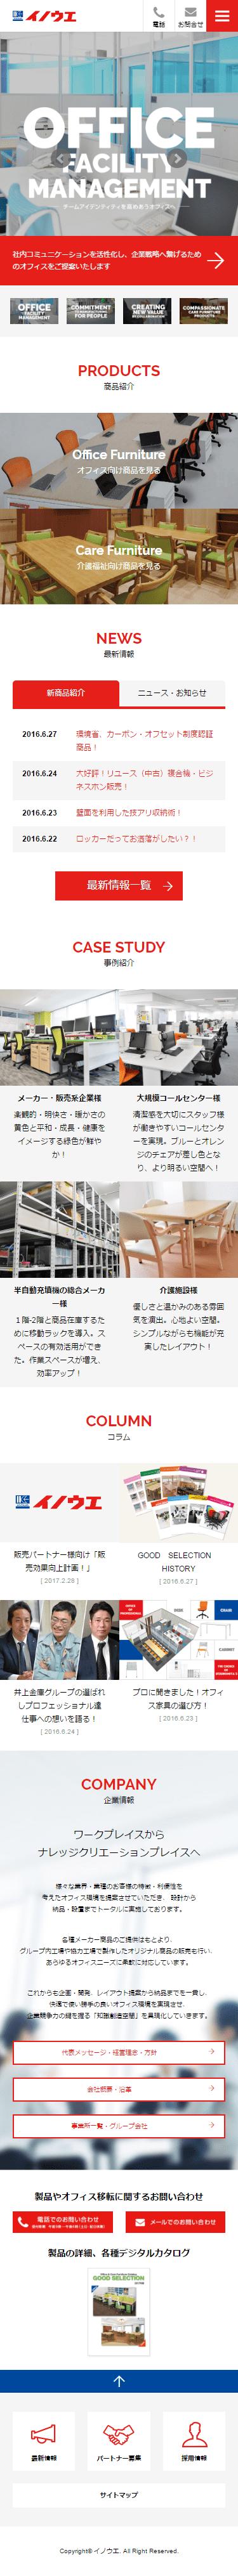 福井市 井上金庫販売株式会社様 ホームページ制作3